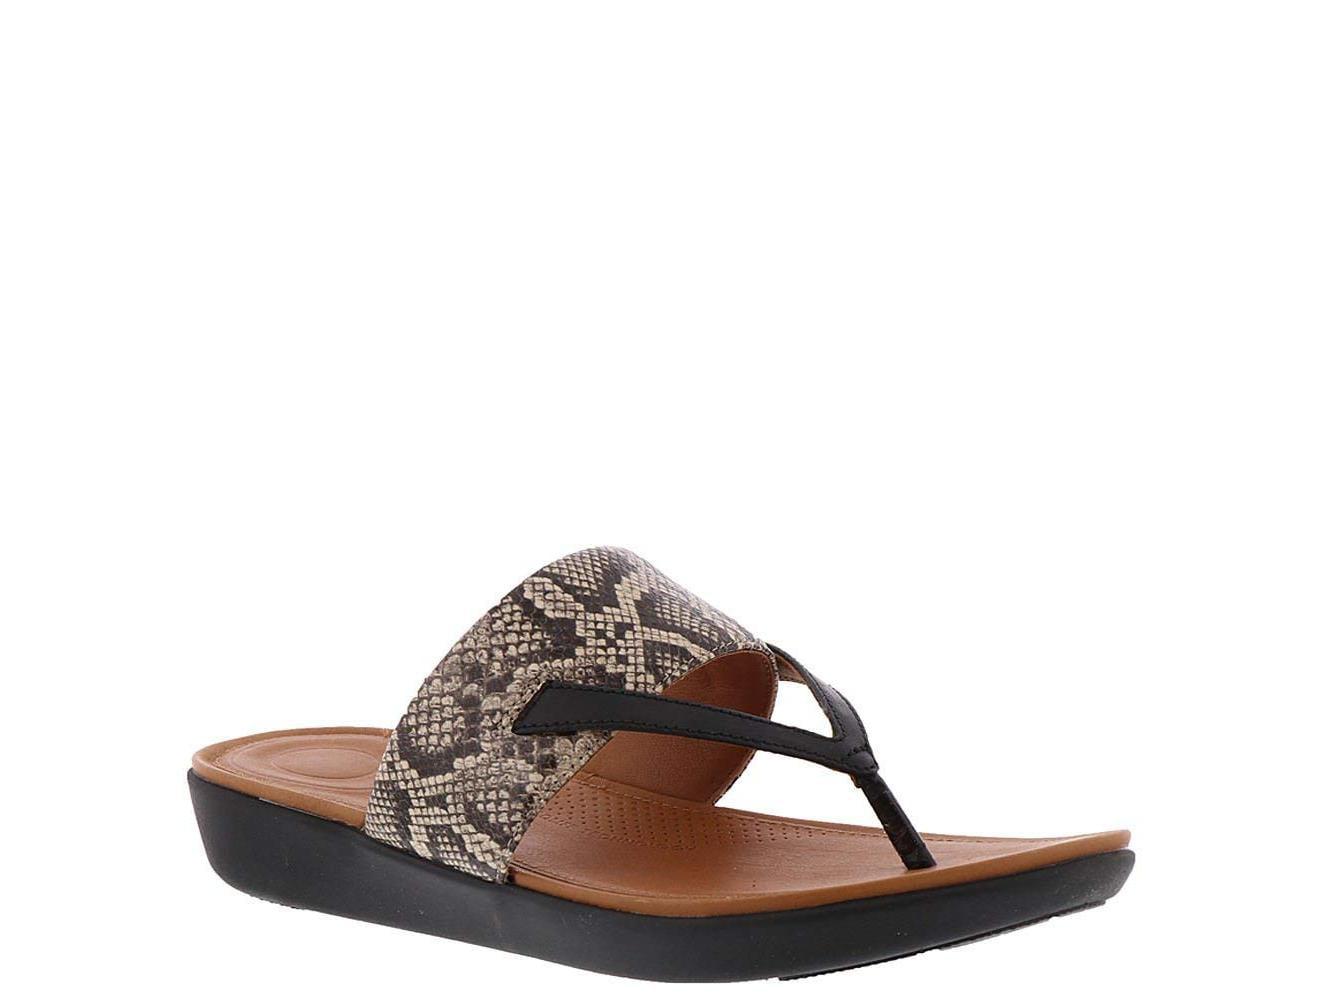 37664751f3f Fitflop womens delta toe thong sandals jpg 1333x1000 Toe thong sandals